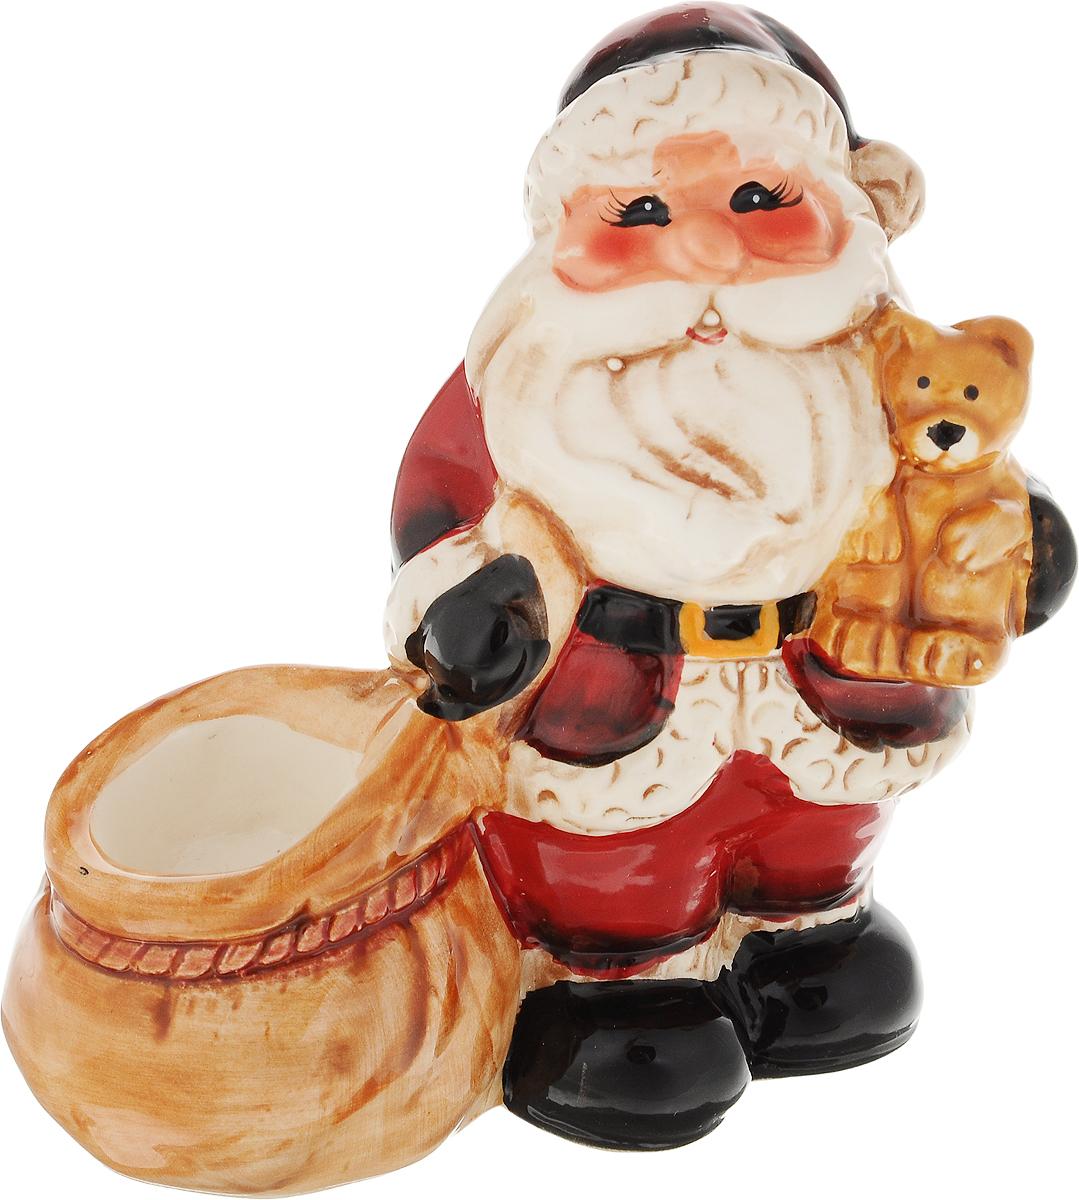 Подсвечник новогодний Win Max Дед Мороз с подарками, цвет: красный, 11 х 7 х 11 см119427